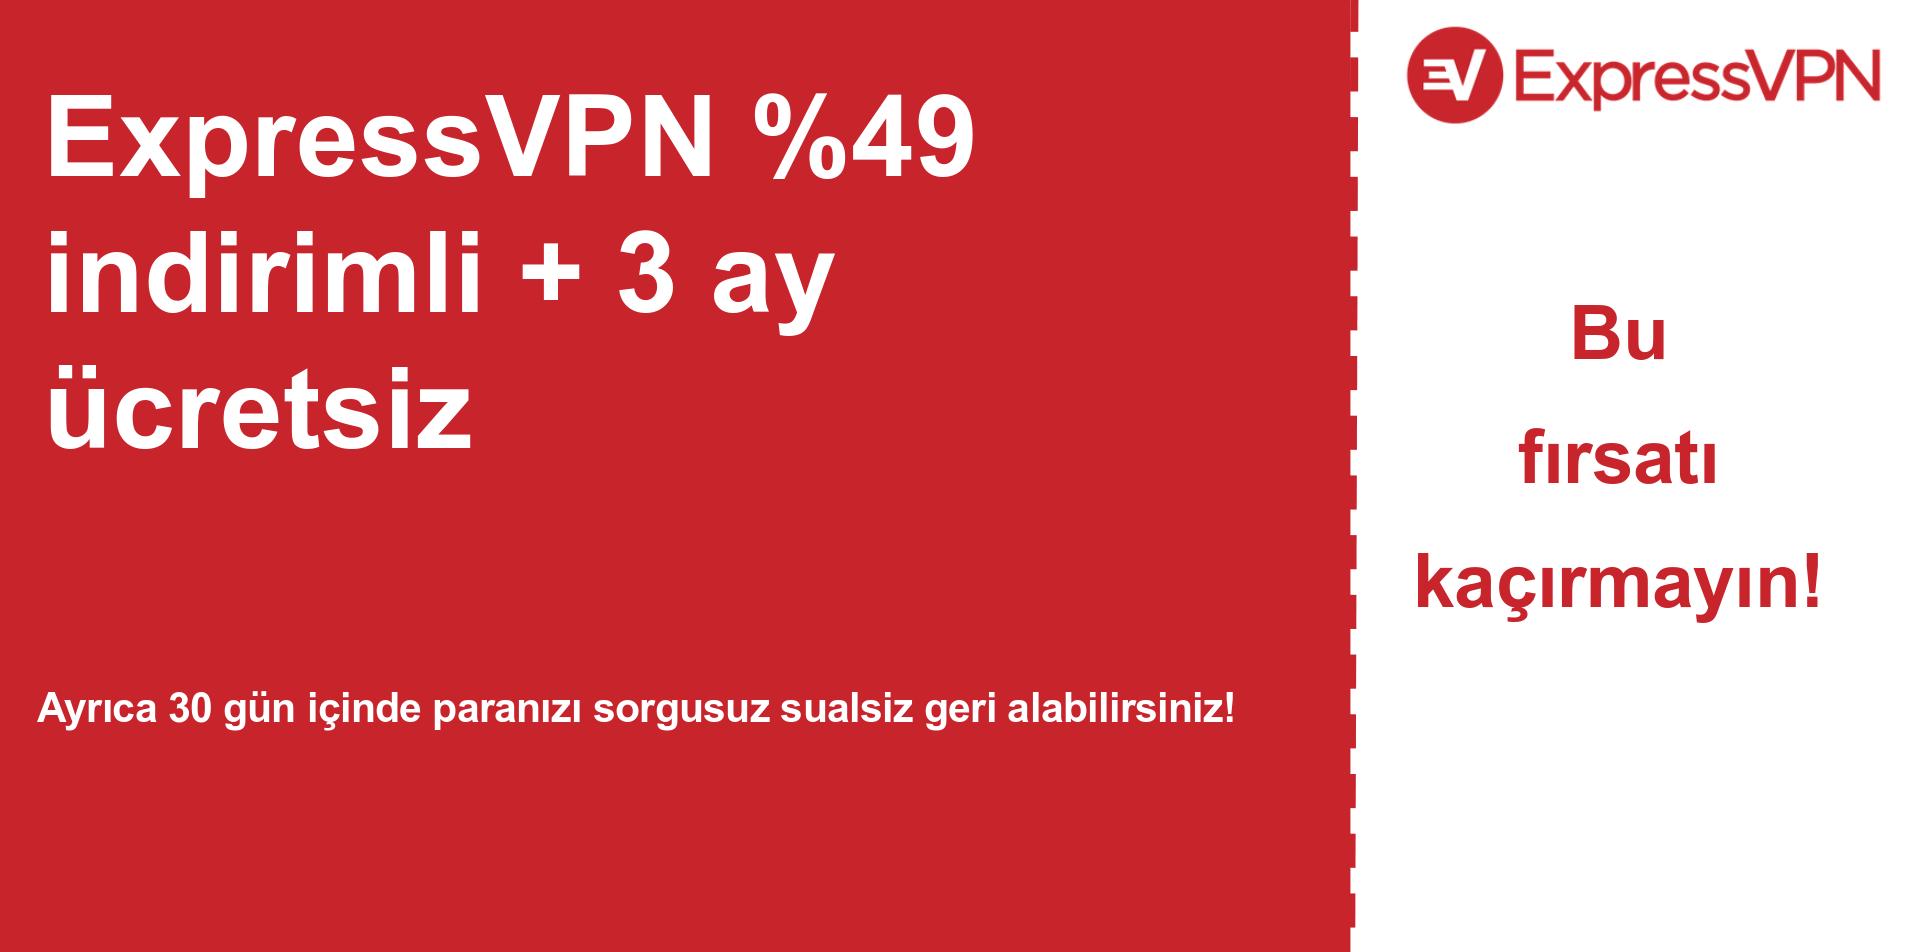 % 49 indirim gösteren ExpressVPN ana kupon banner grafiği